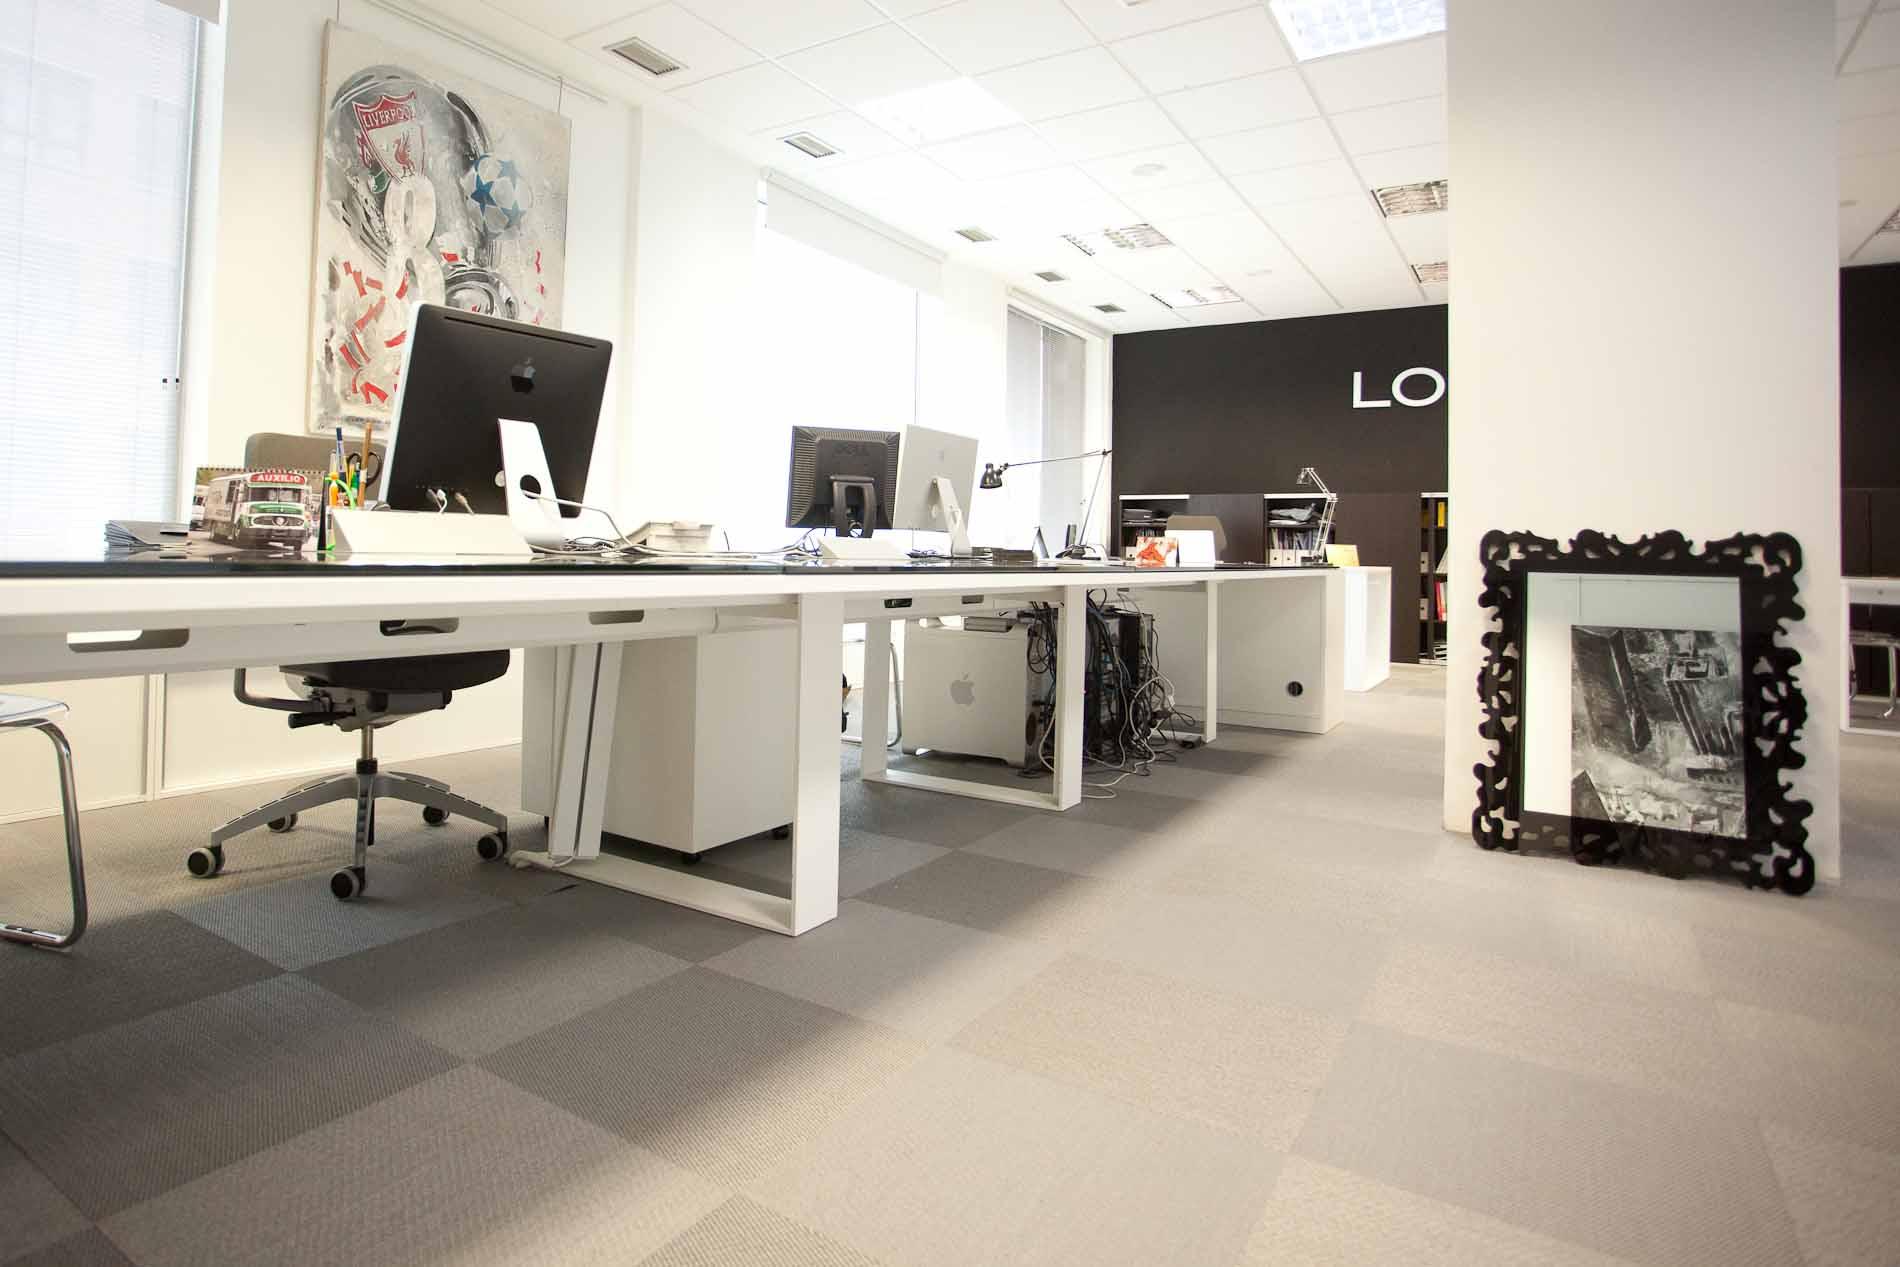 Oficina Lombok Design